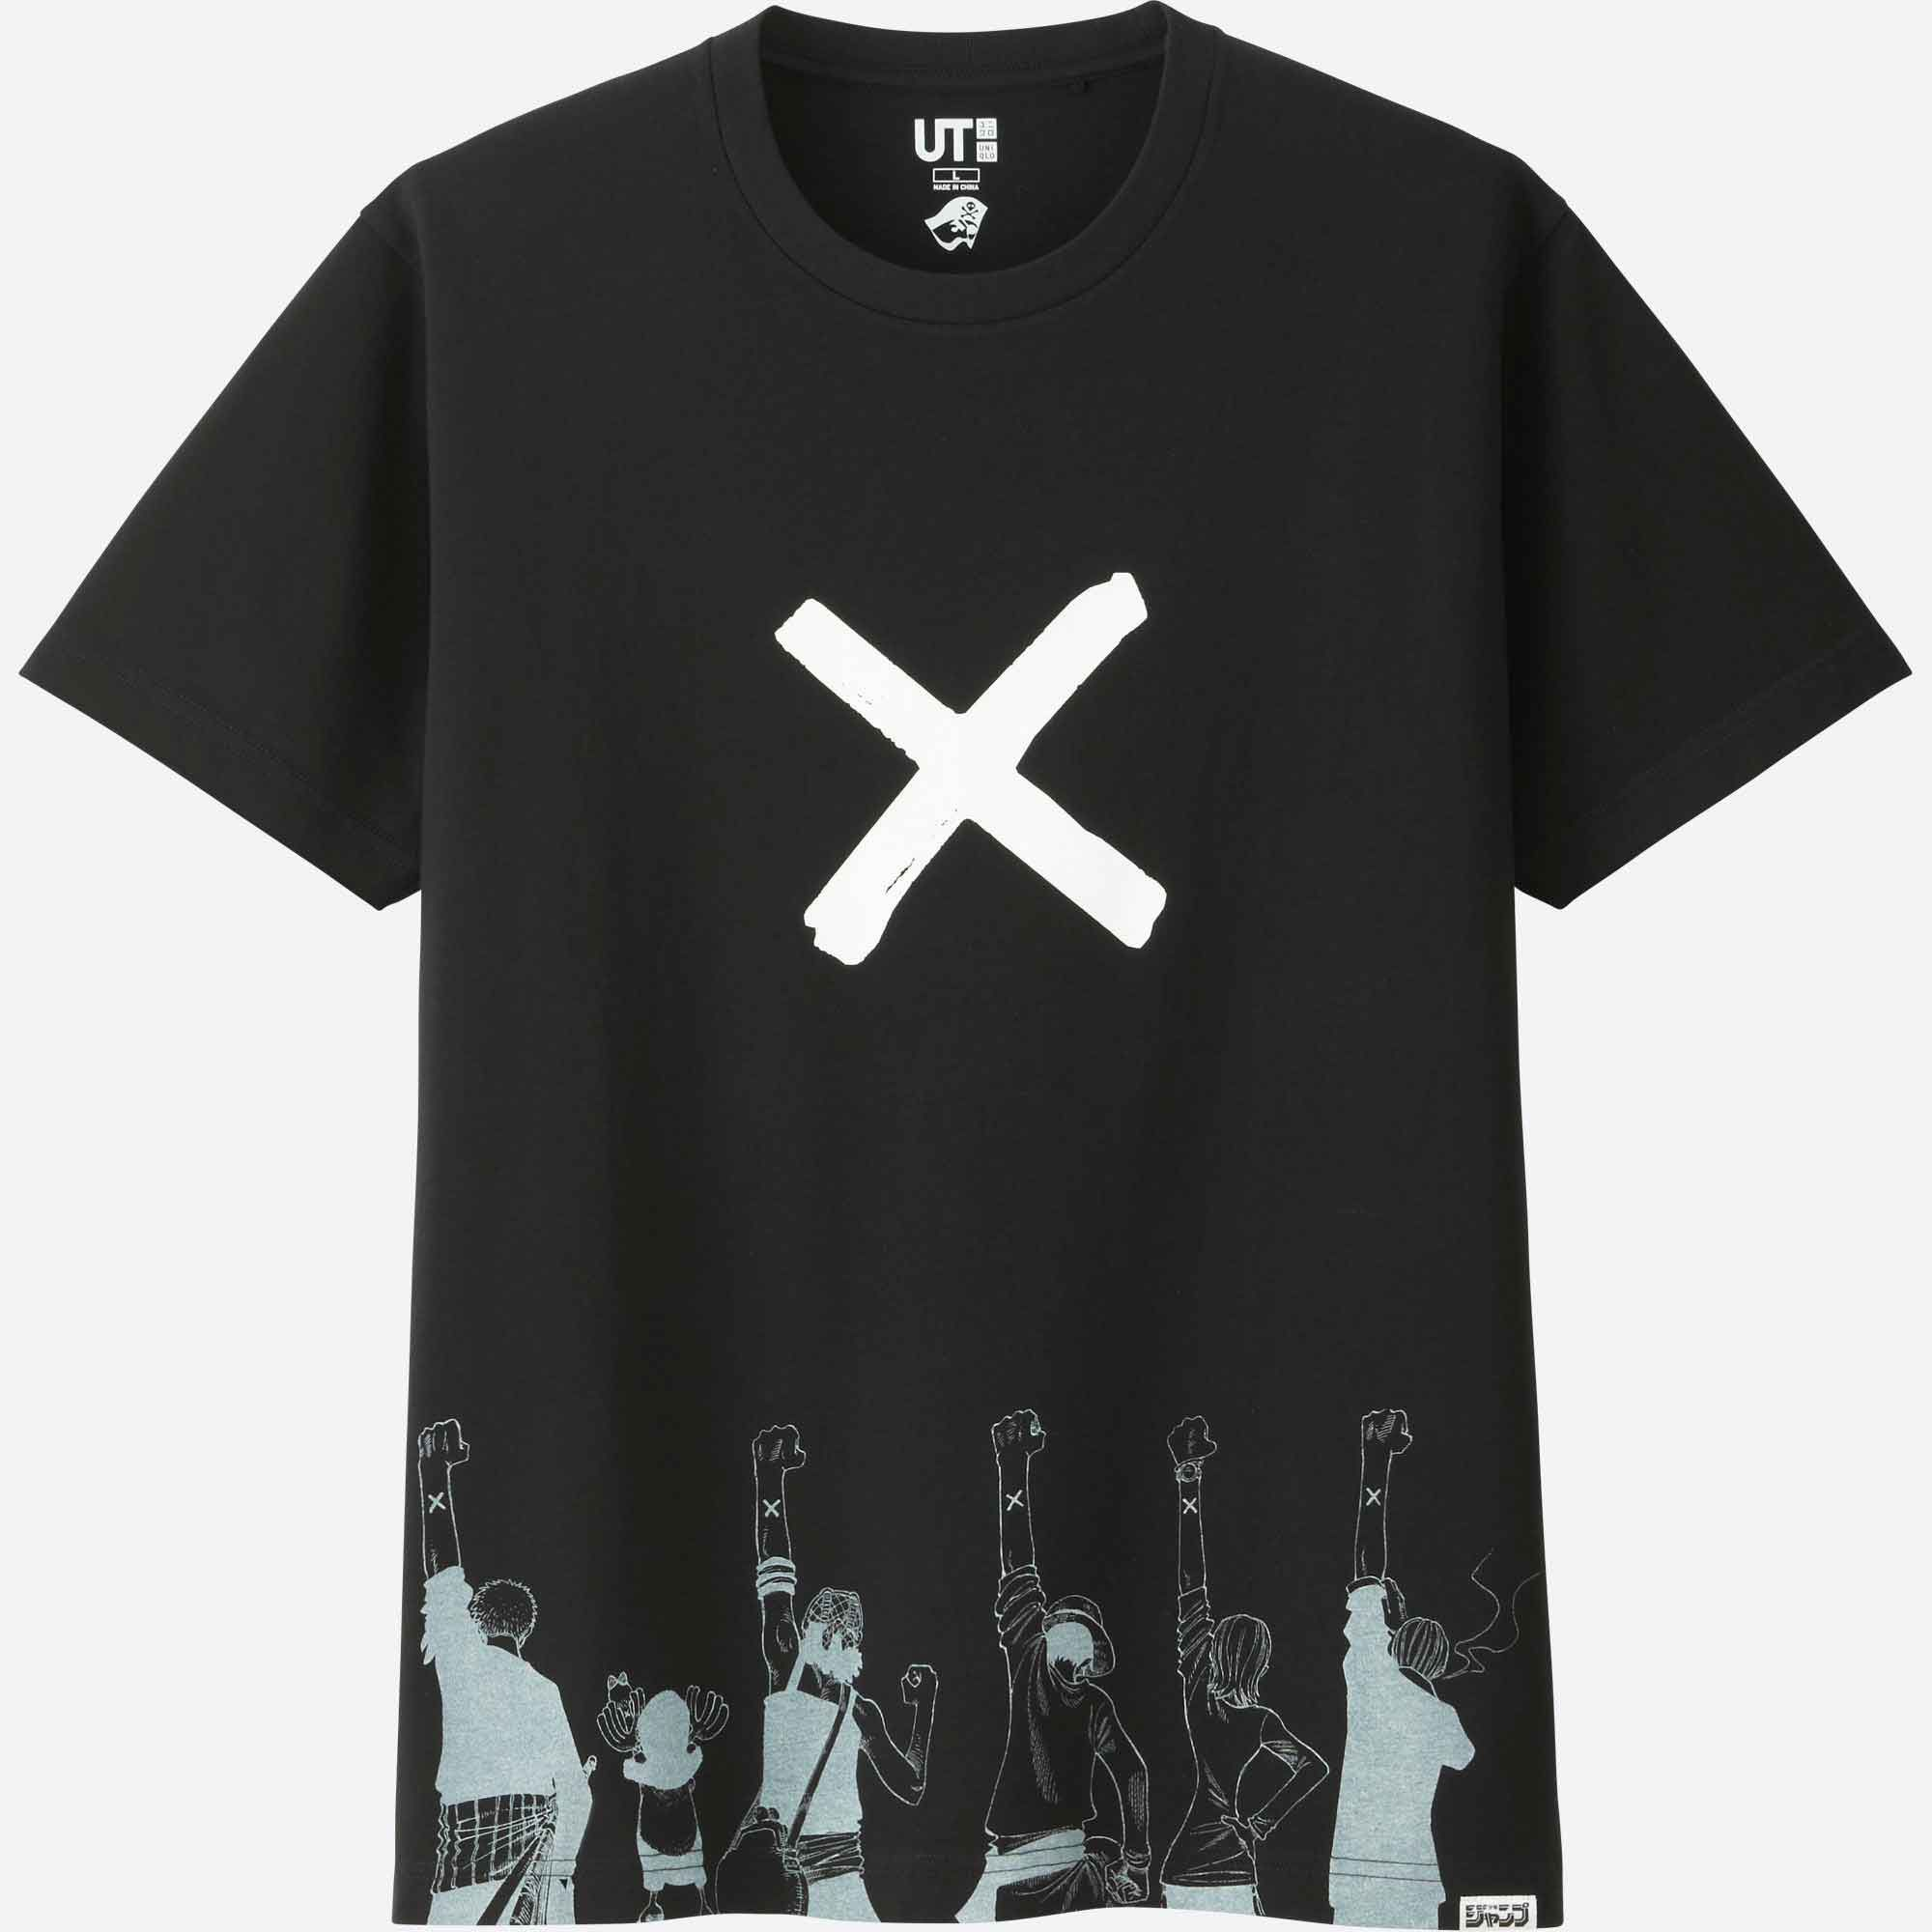 The Uniqlo Ut Graphic Tee Collection Uniqlo Us Uniqlo Us Uniqlo Printed Tees For Men Anime Shirt